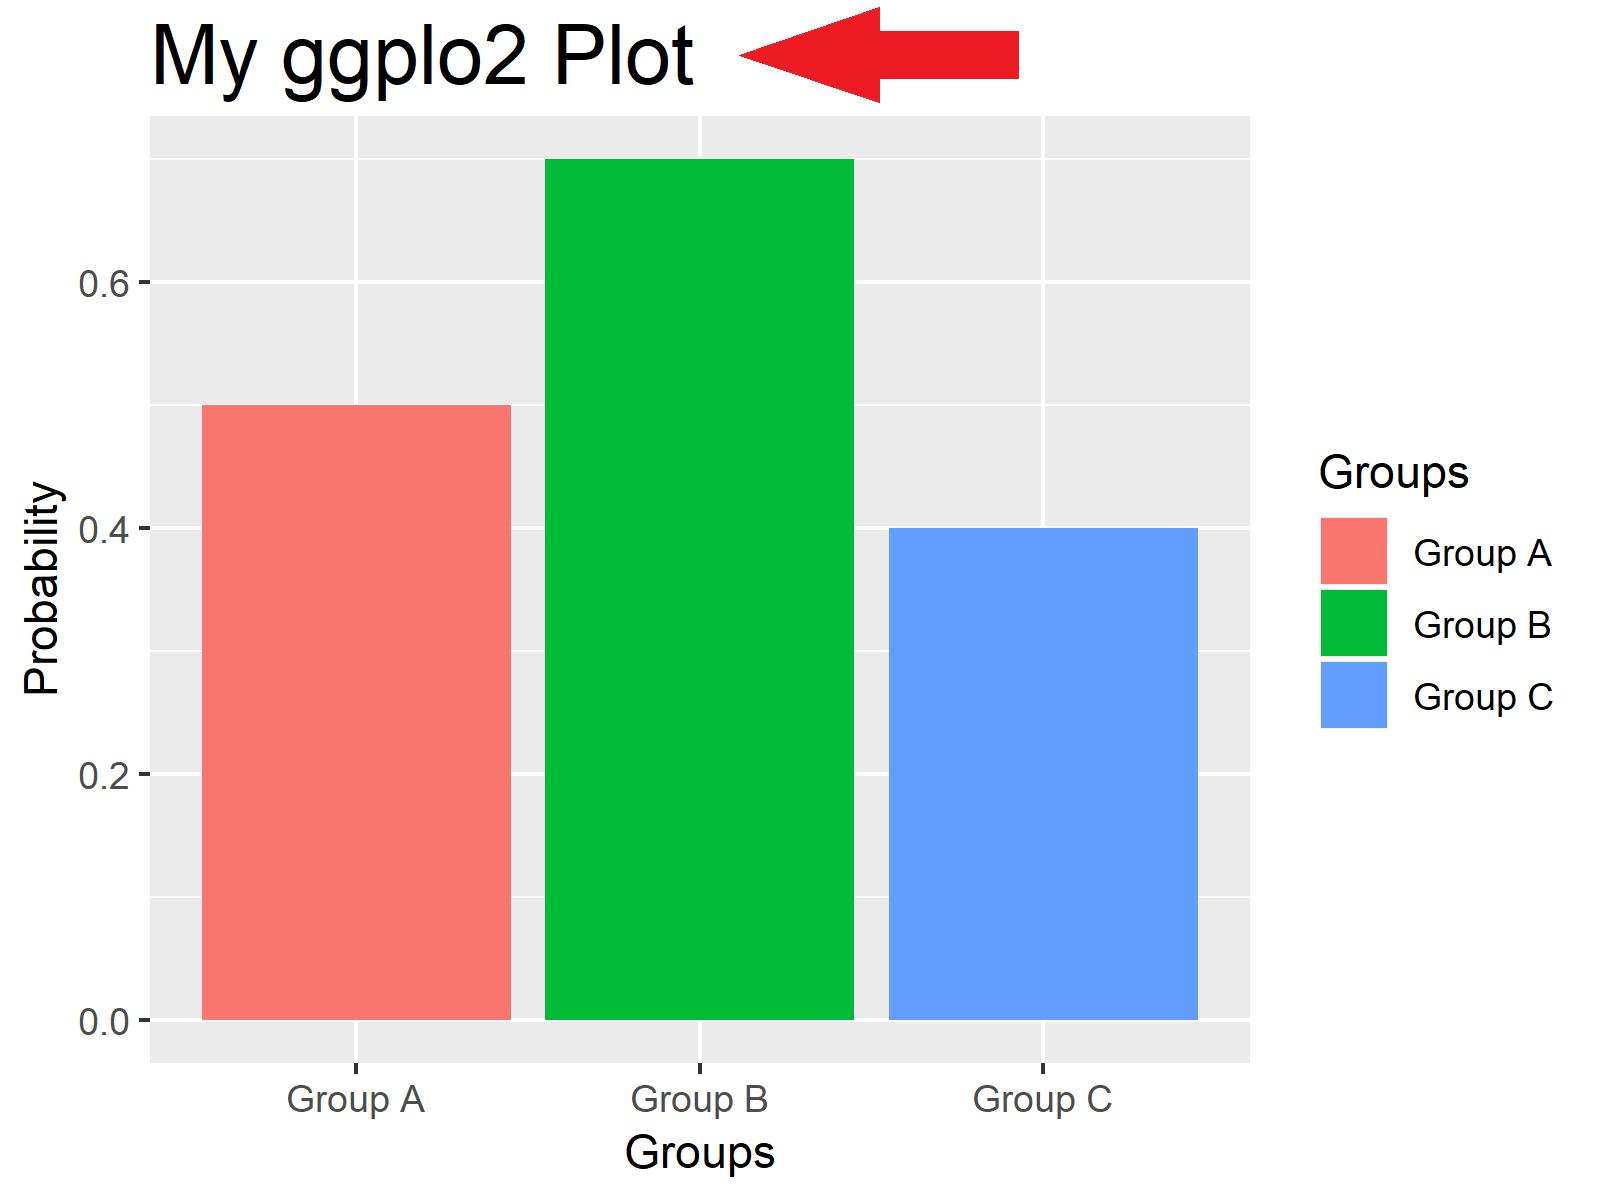 r ggplot2 plot font size of main title